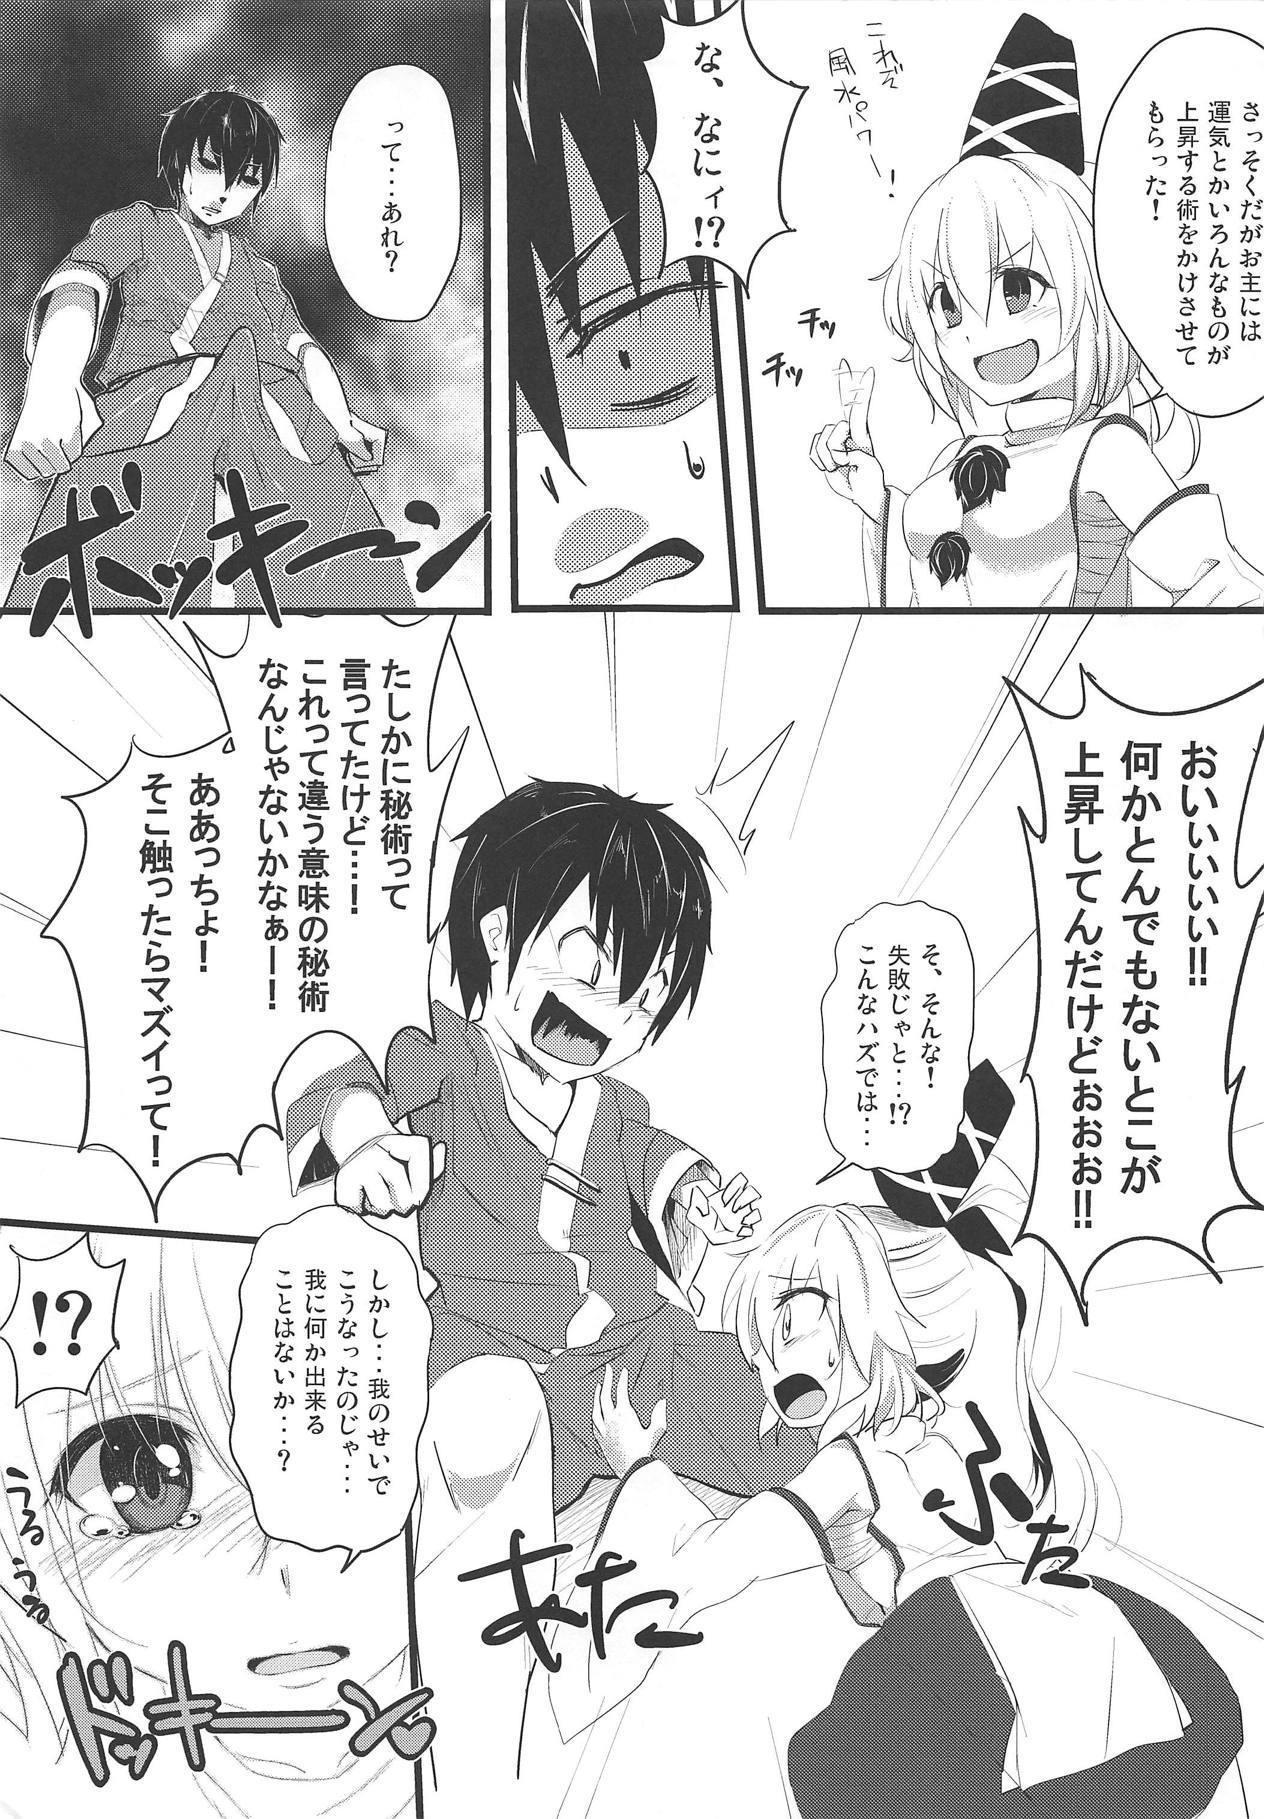 Gouzoku Ranbu Mujihix EX. 3